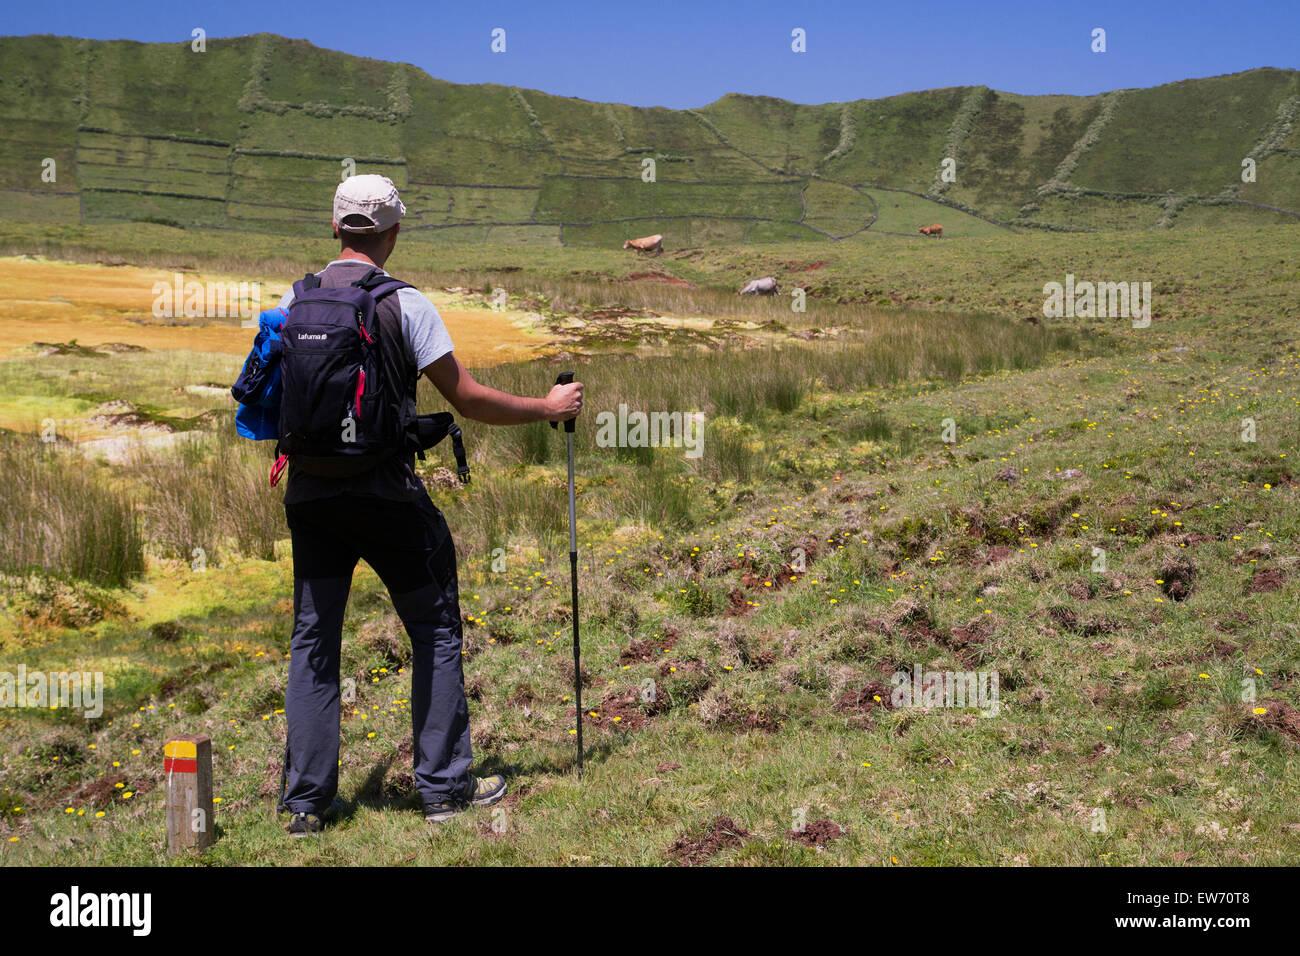 Touristischen hinunter in den Vulkan Krater Wanderweg auf der Insel Corvo Azoren Stockbild